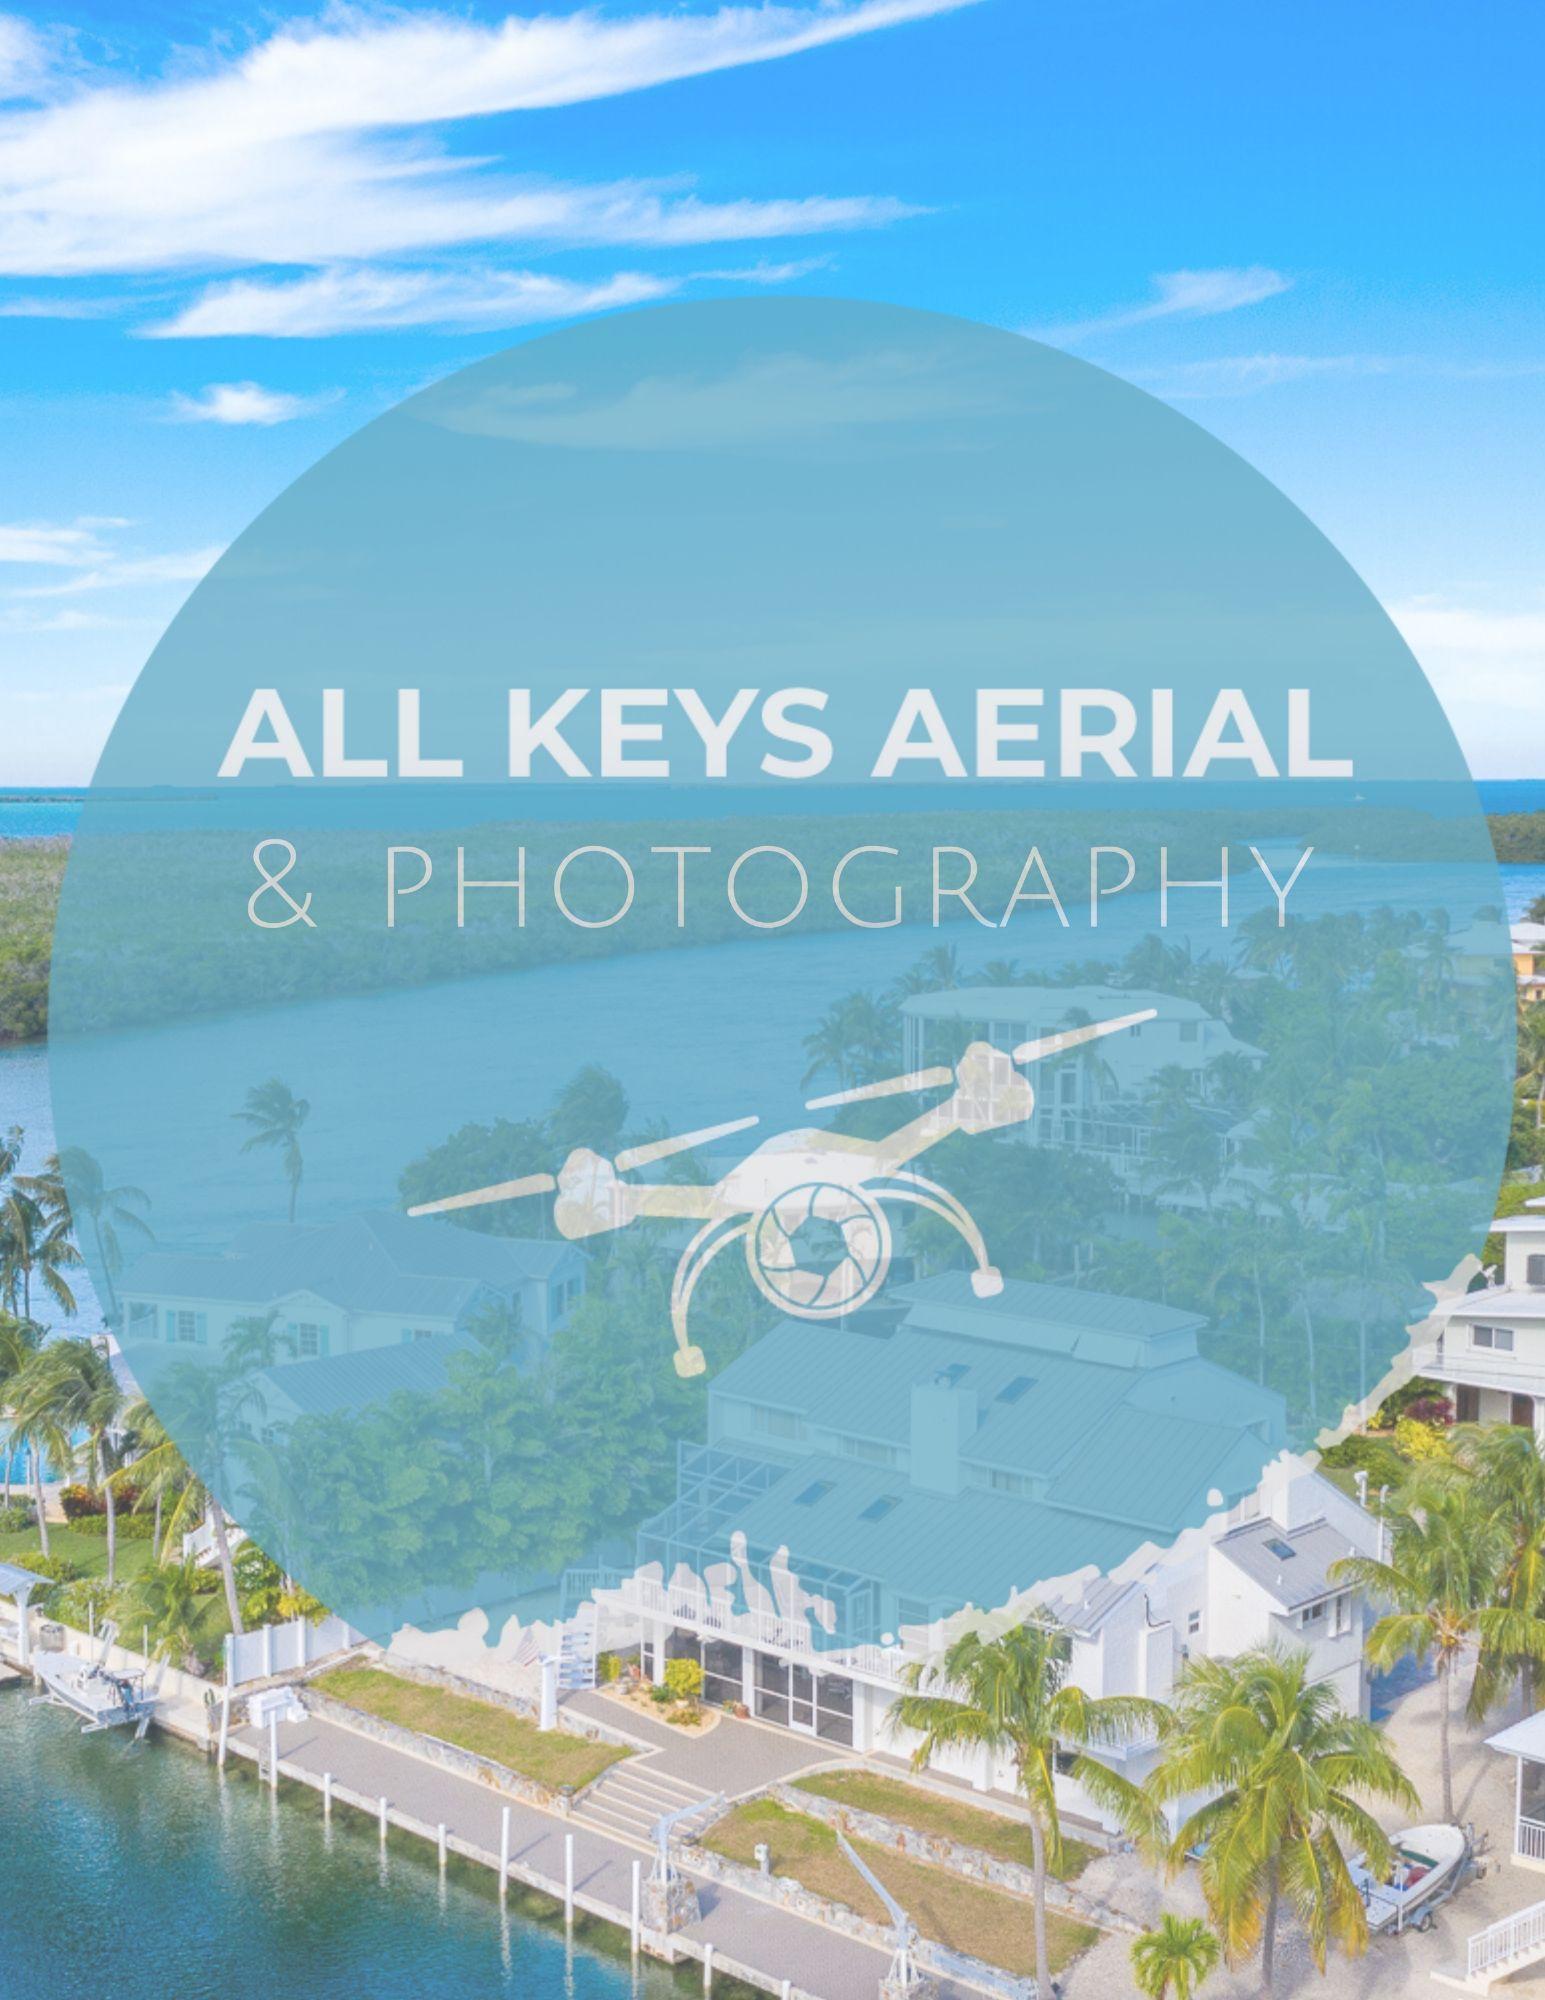 All Keys Aerial & Photography floor plan in Boca Raton Jupiter Manalapan North Palm Beach Palm Beach Palm Beach Gardens Tequesta Wellington West Palm Beach